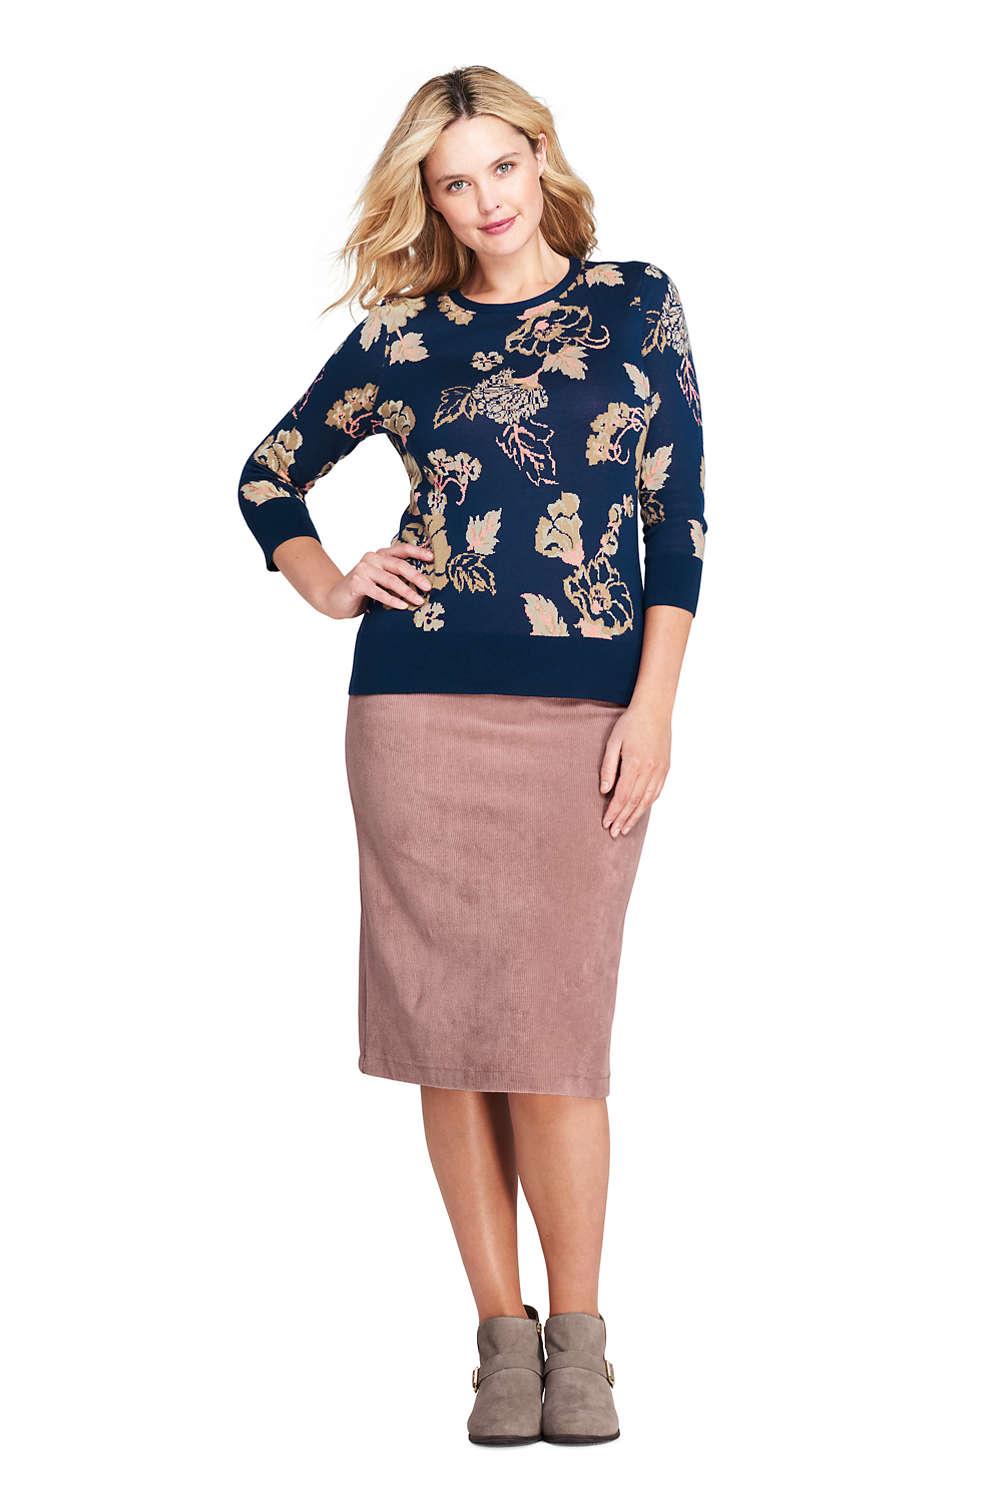 319c8ba1080dd Women s Plus Size Sport Cord Skirt from Lands  End